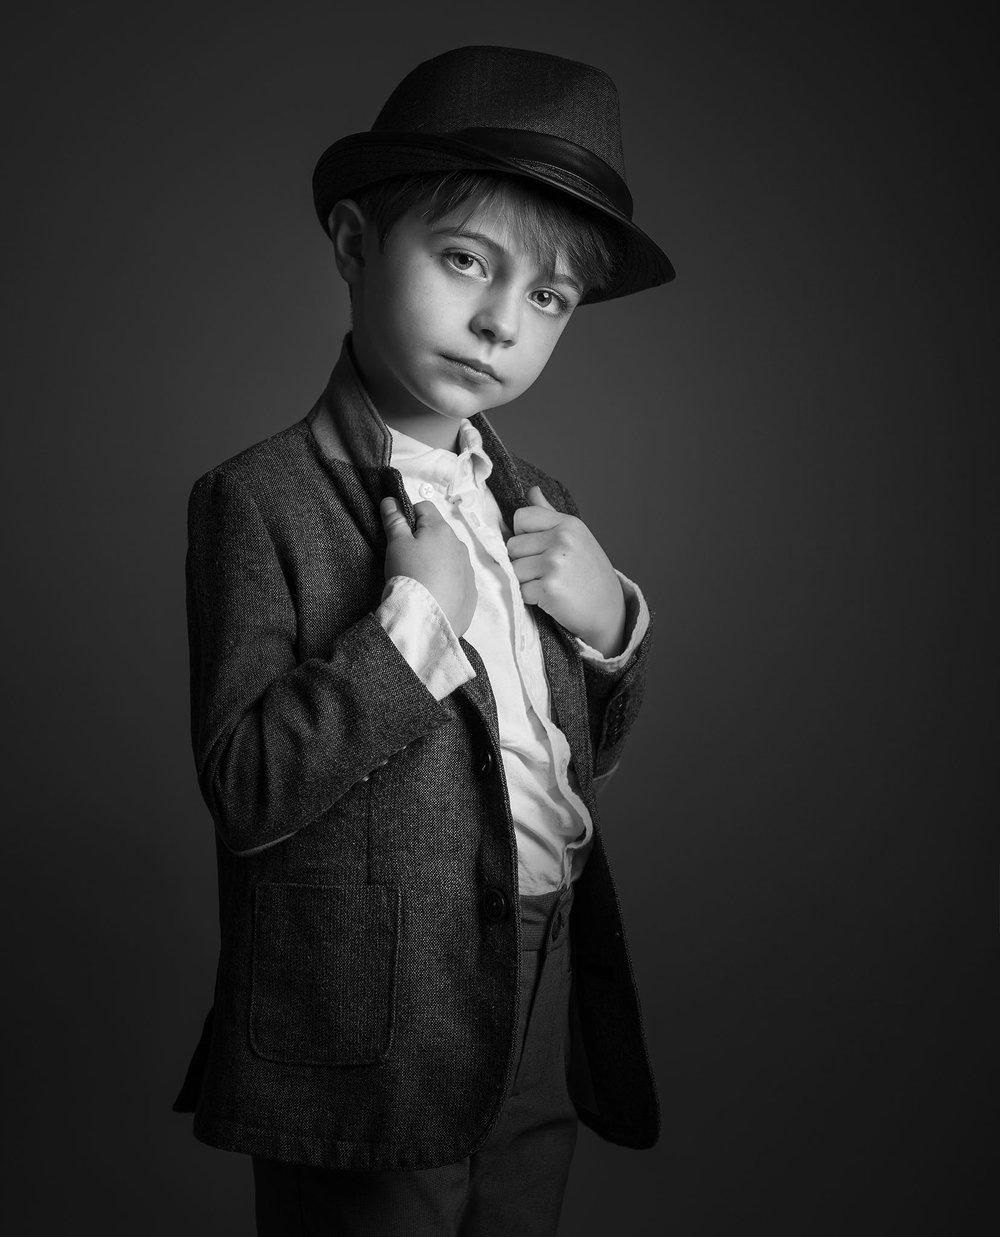 elizabethgphotography_kingslangley_hertfordshire_fineart_childrens_photography_51.jpg